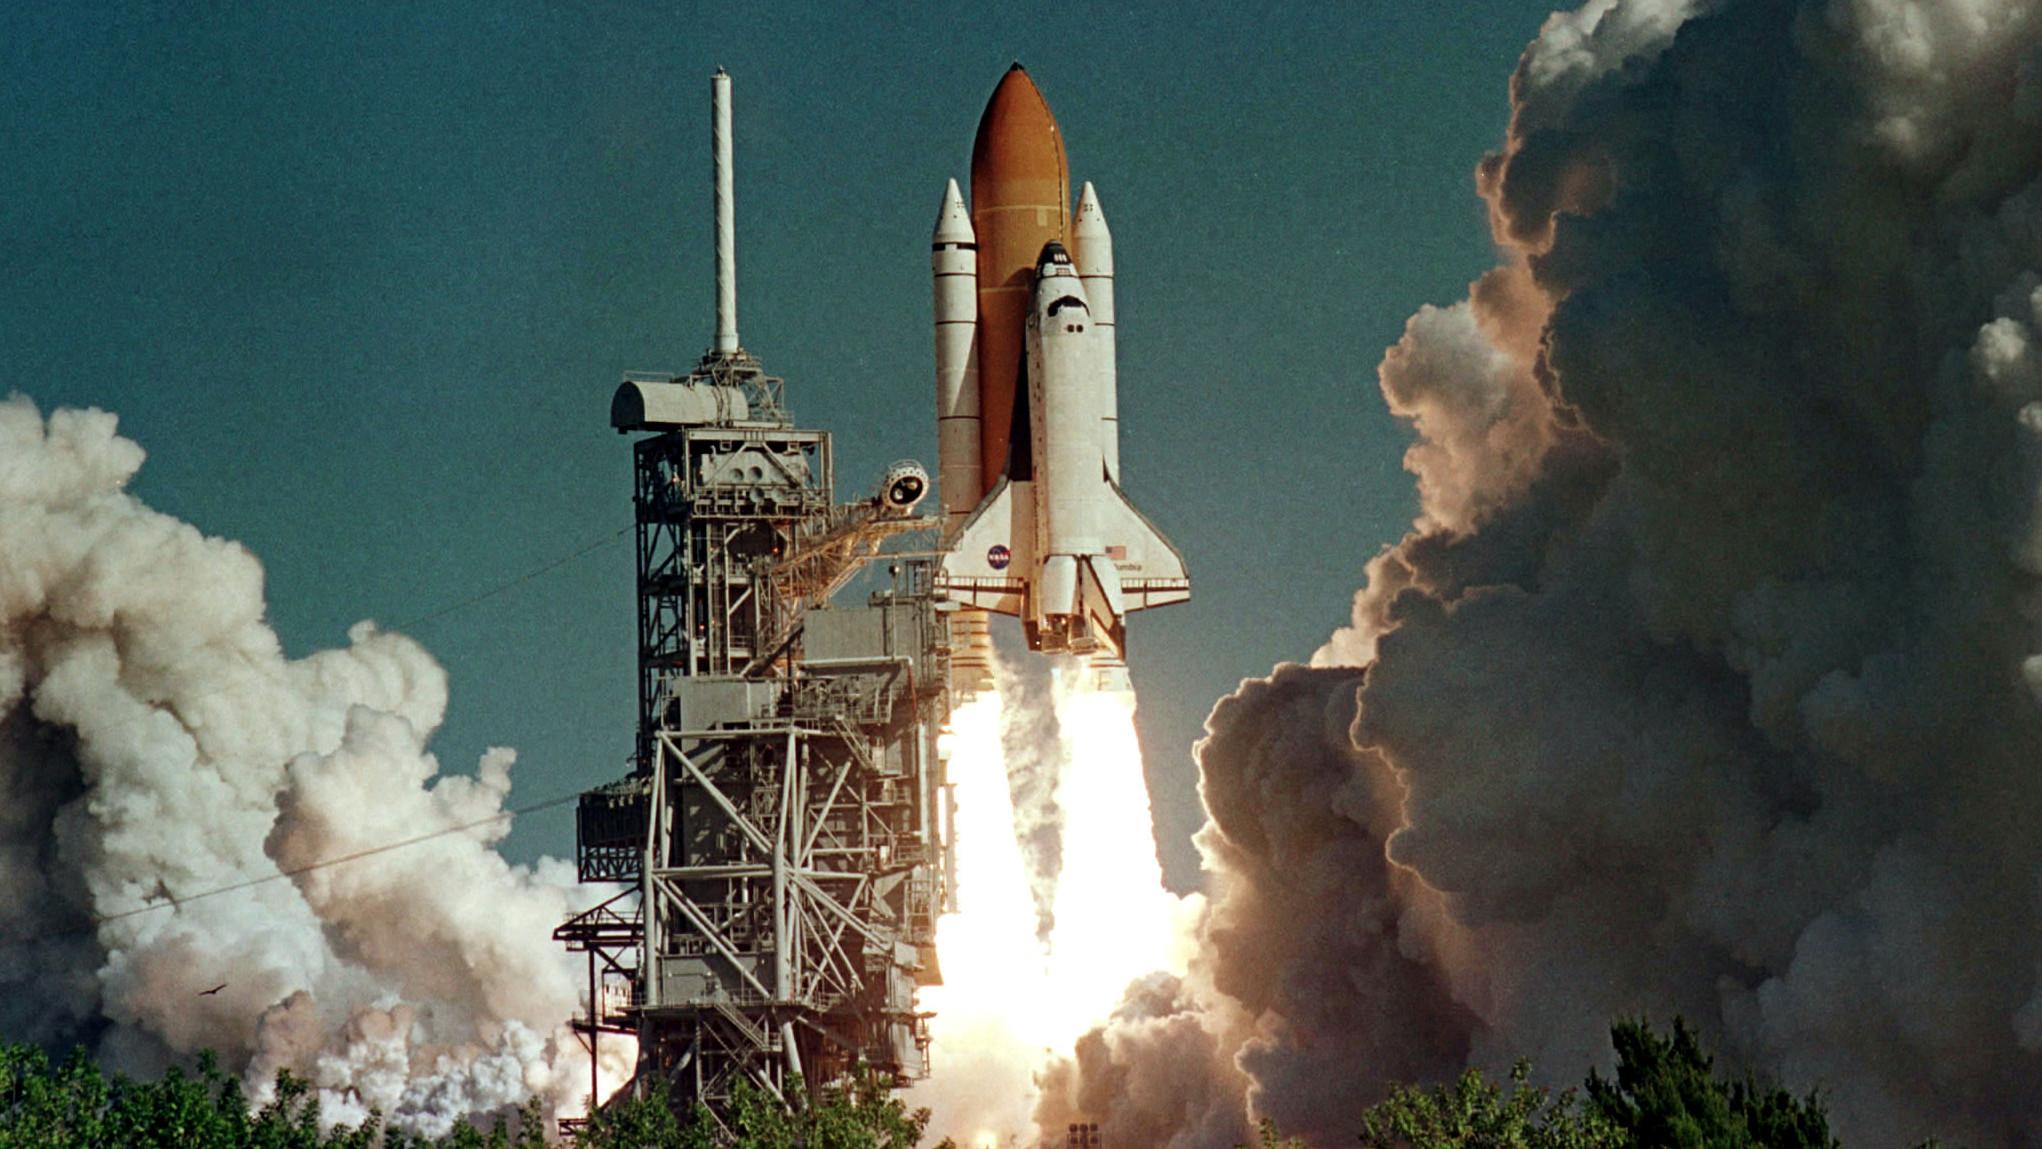 space shuttle columbia ramp - photo #17